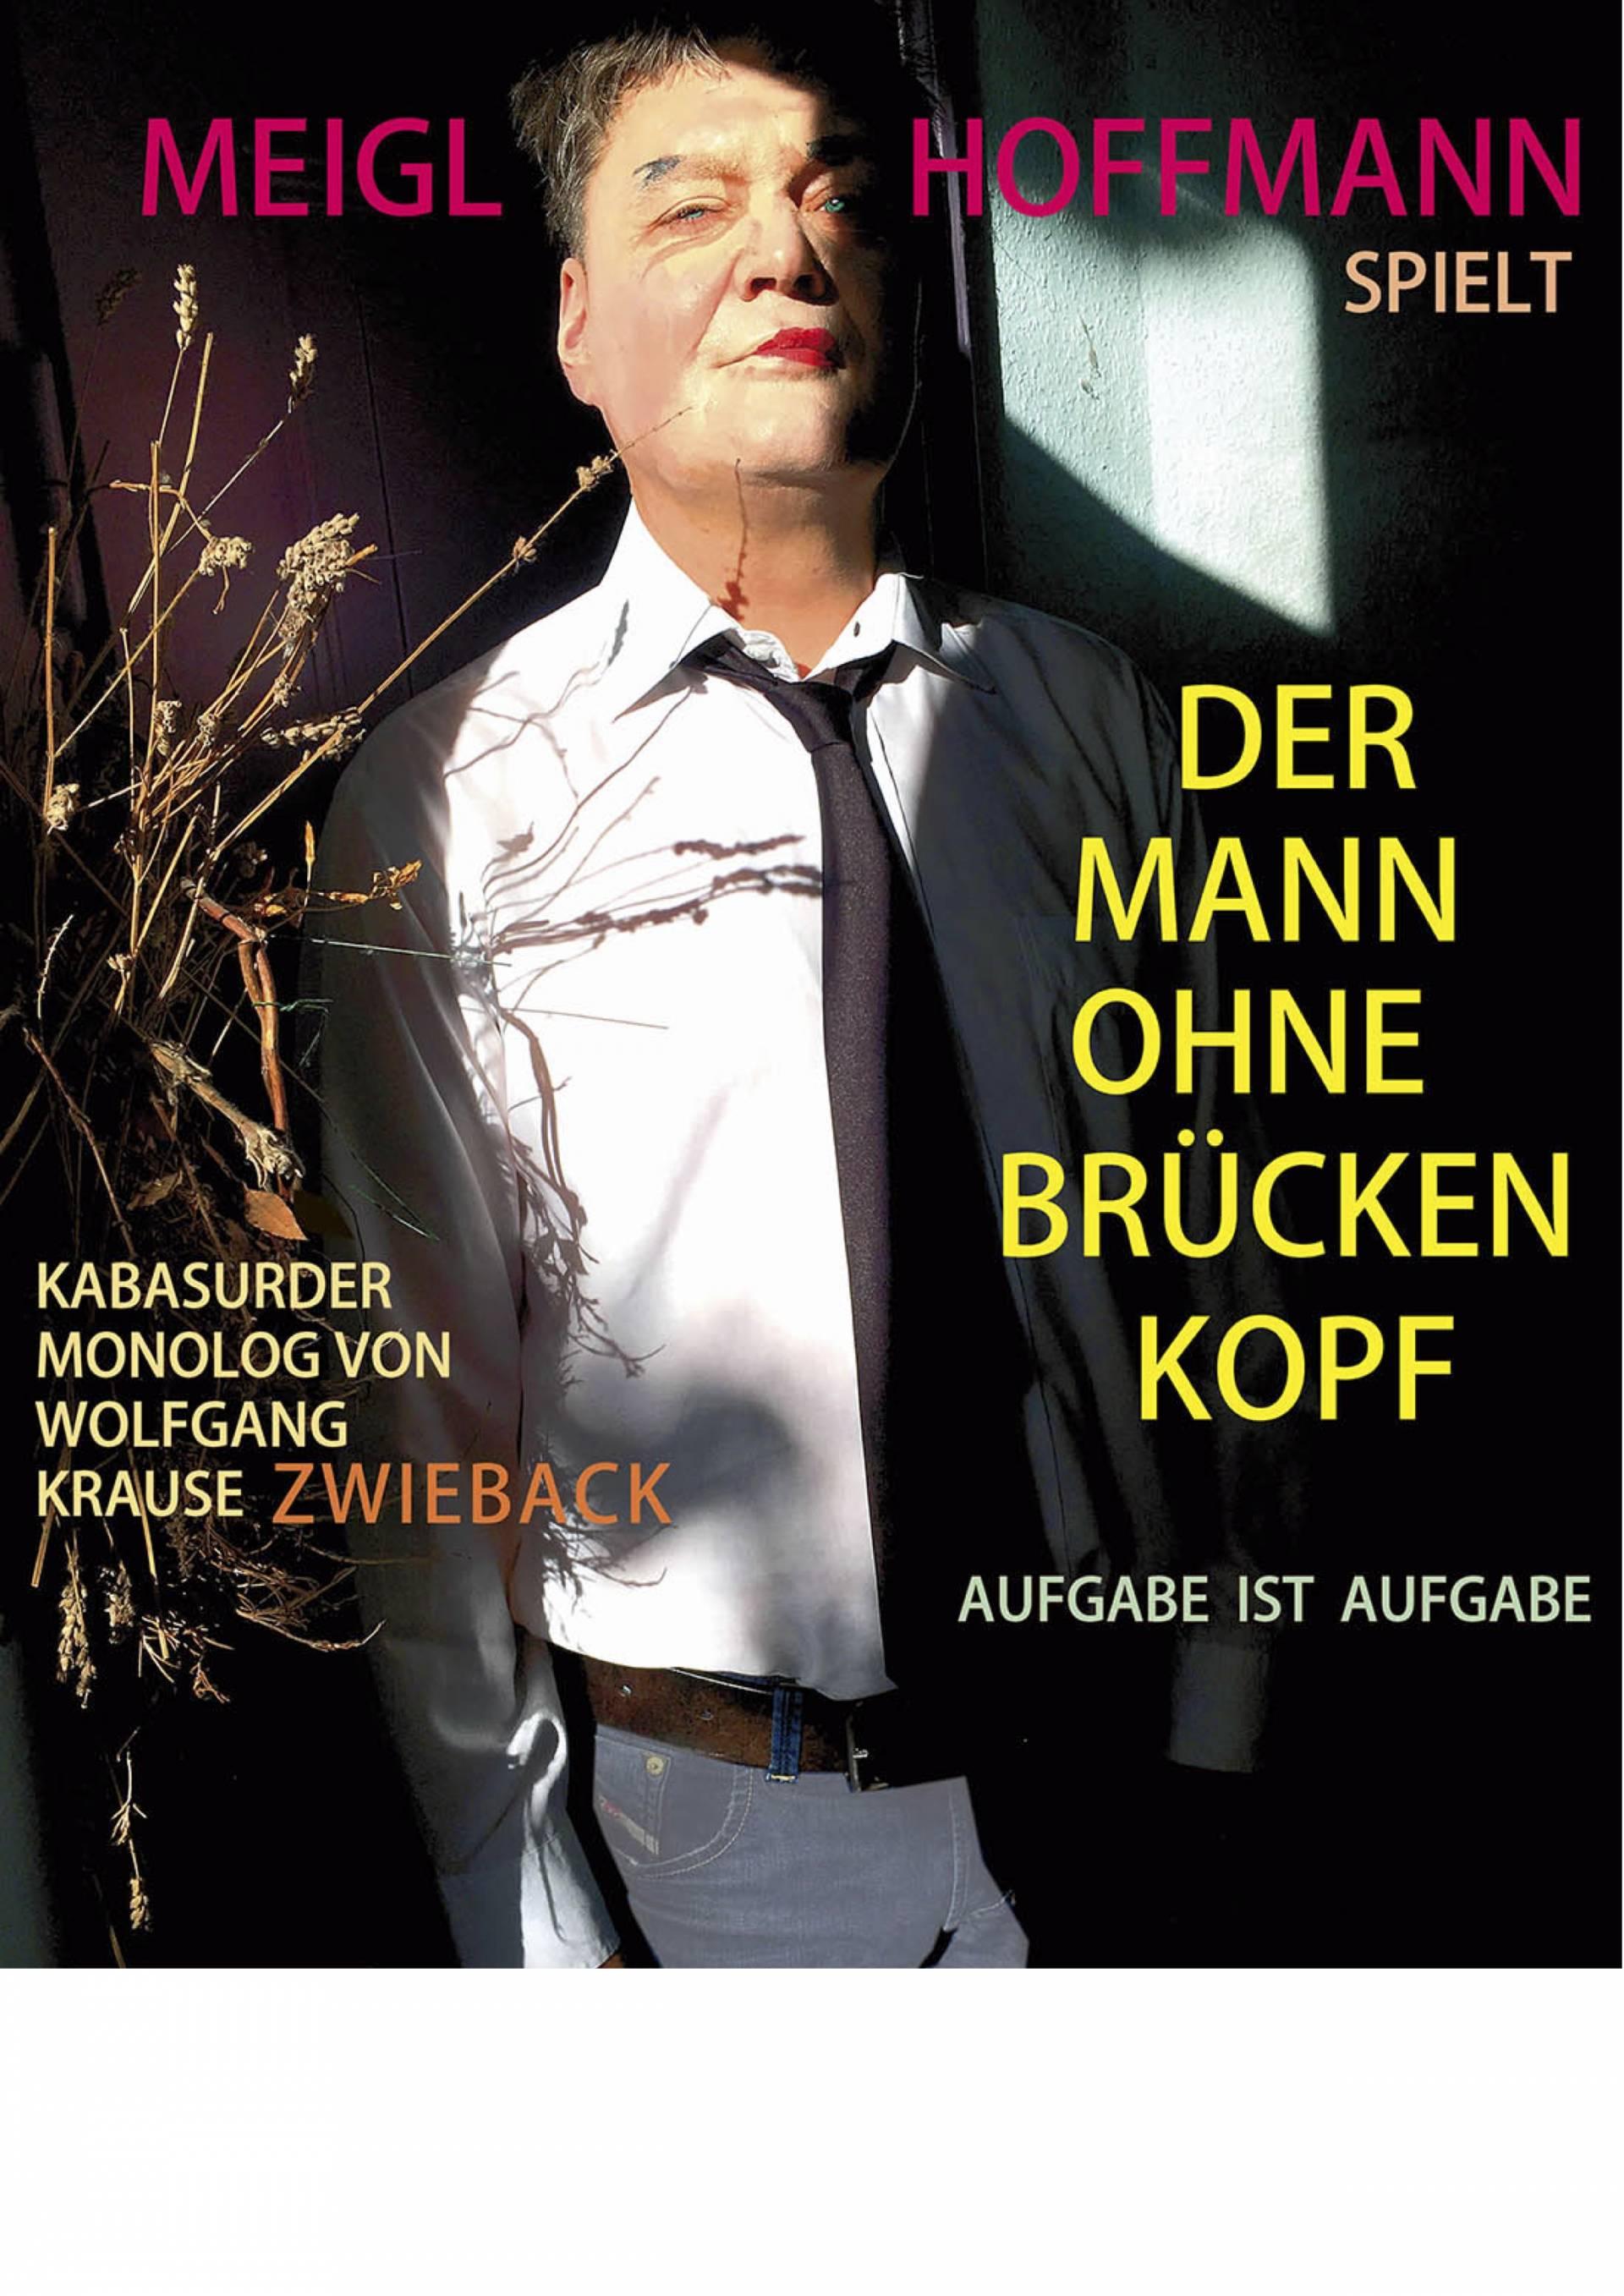 (Foto: Krause Zwieback)